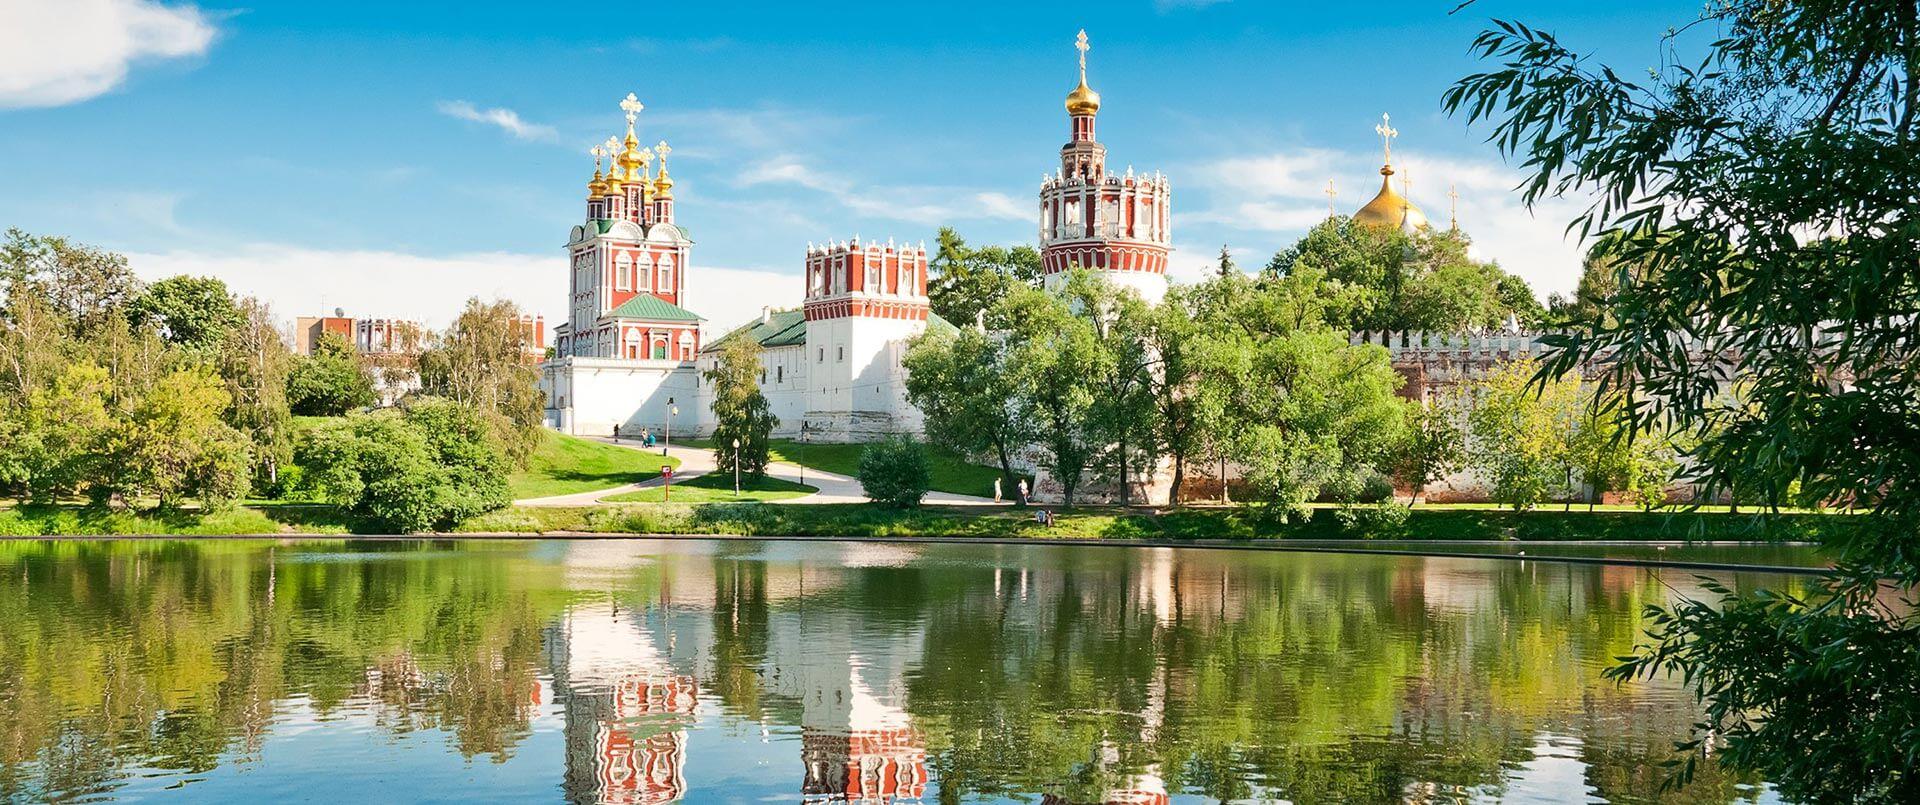 River Cruises in Russia